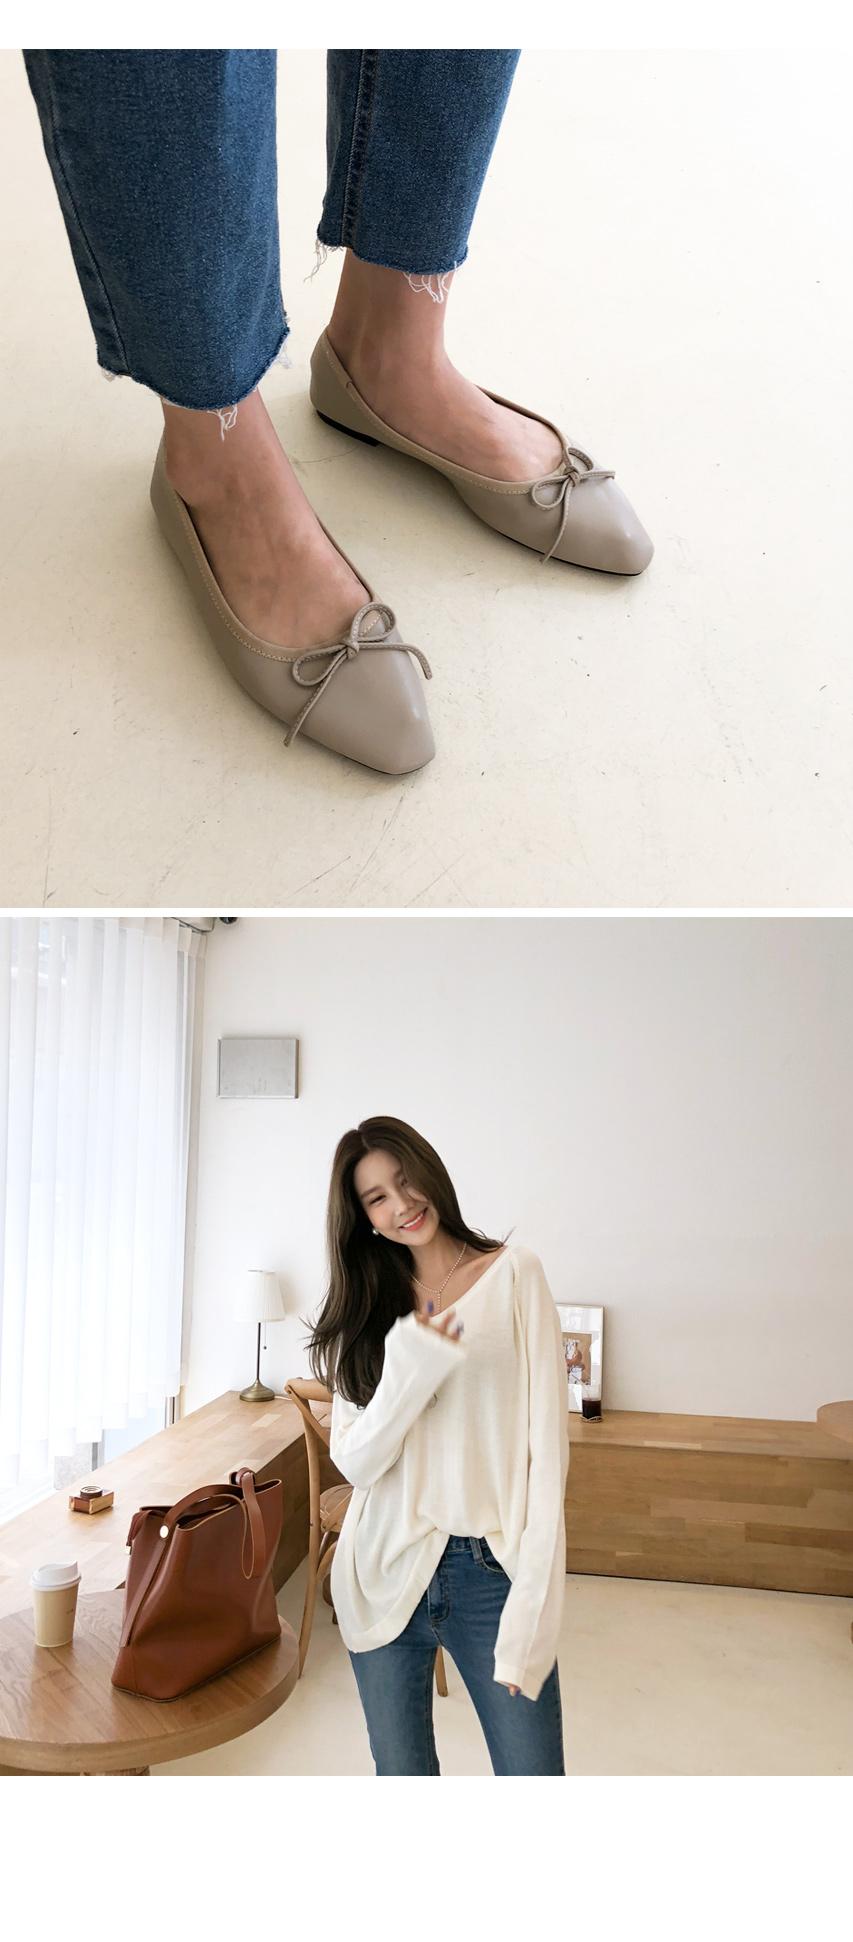 Shy mood shoes